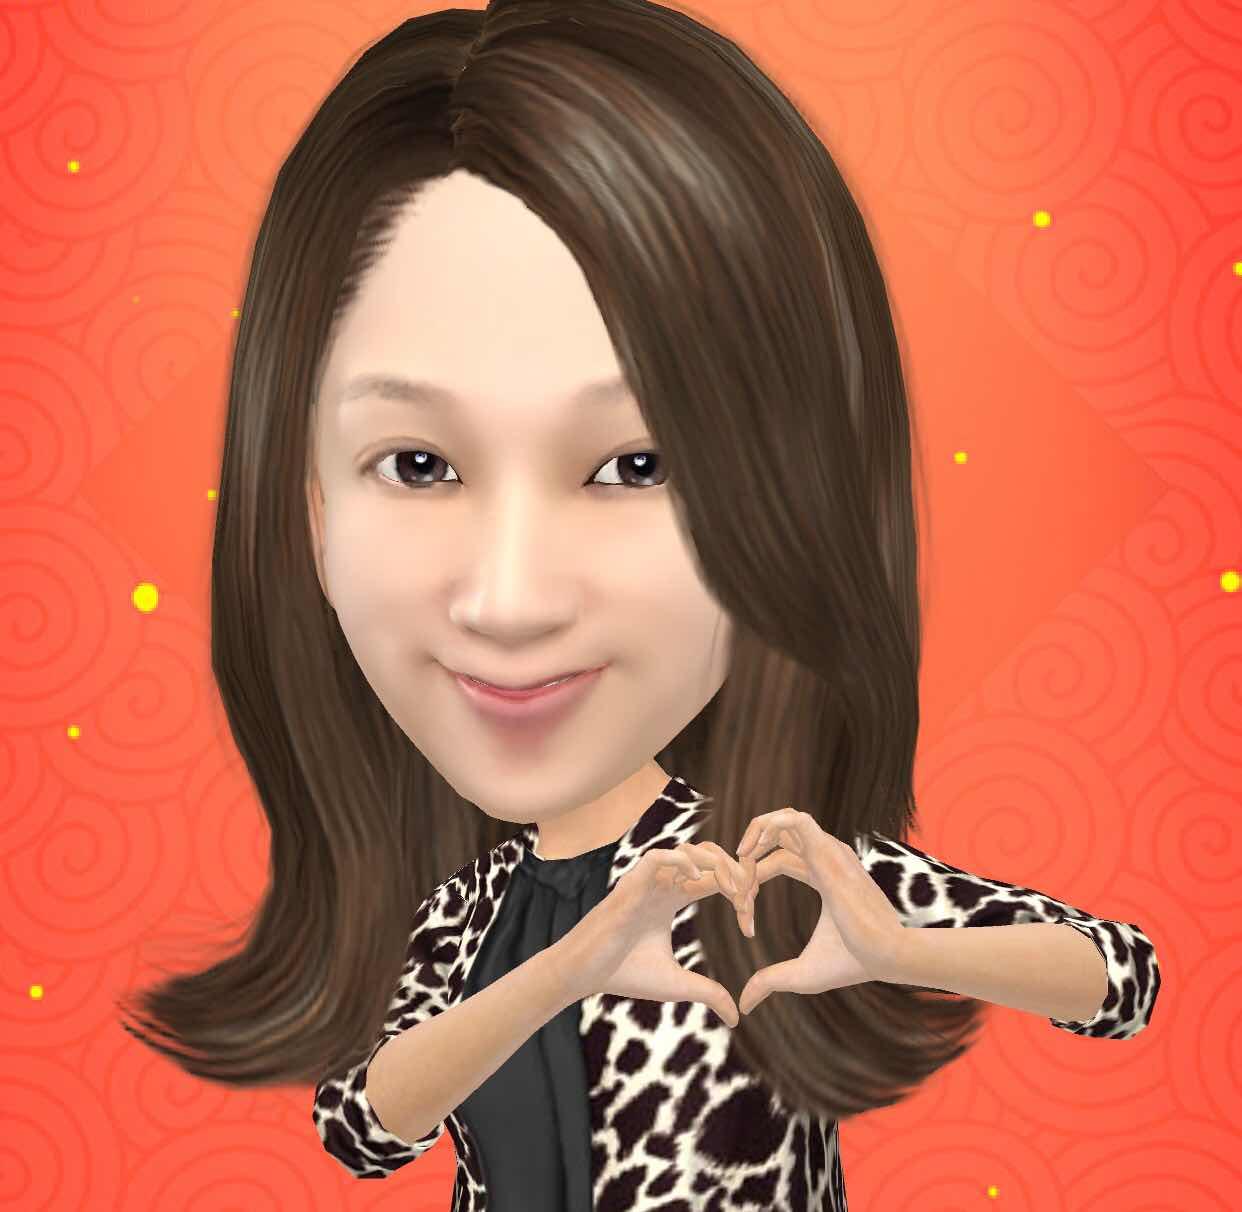 云姐Y(^_^)Y